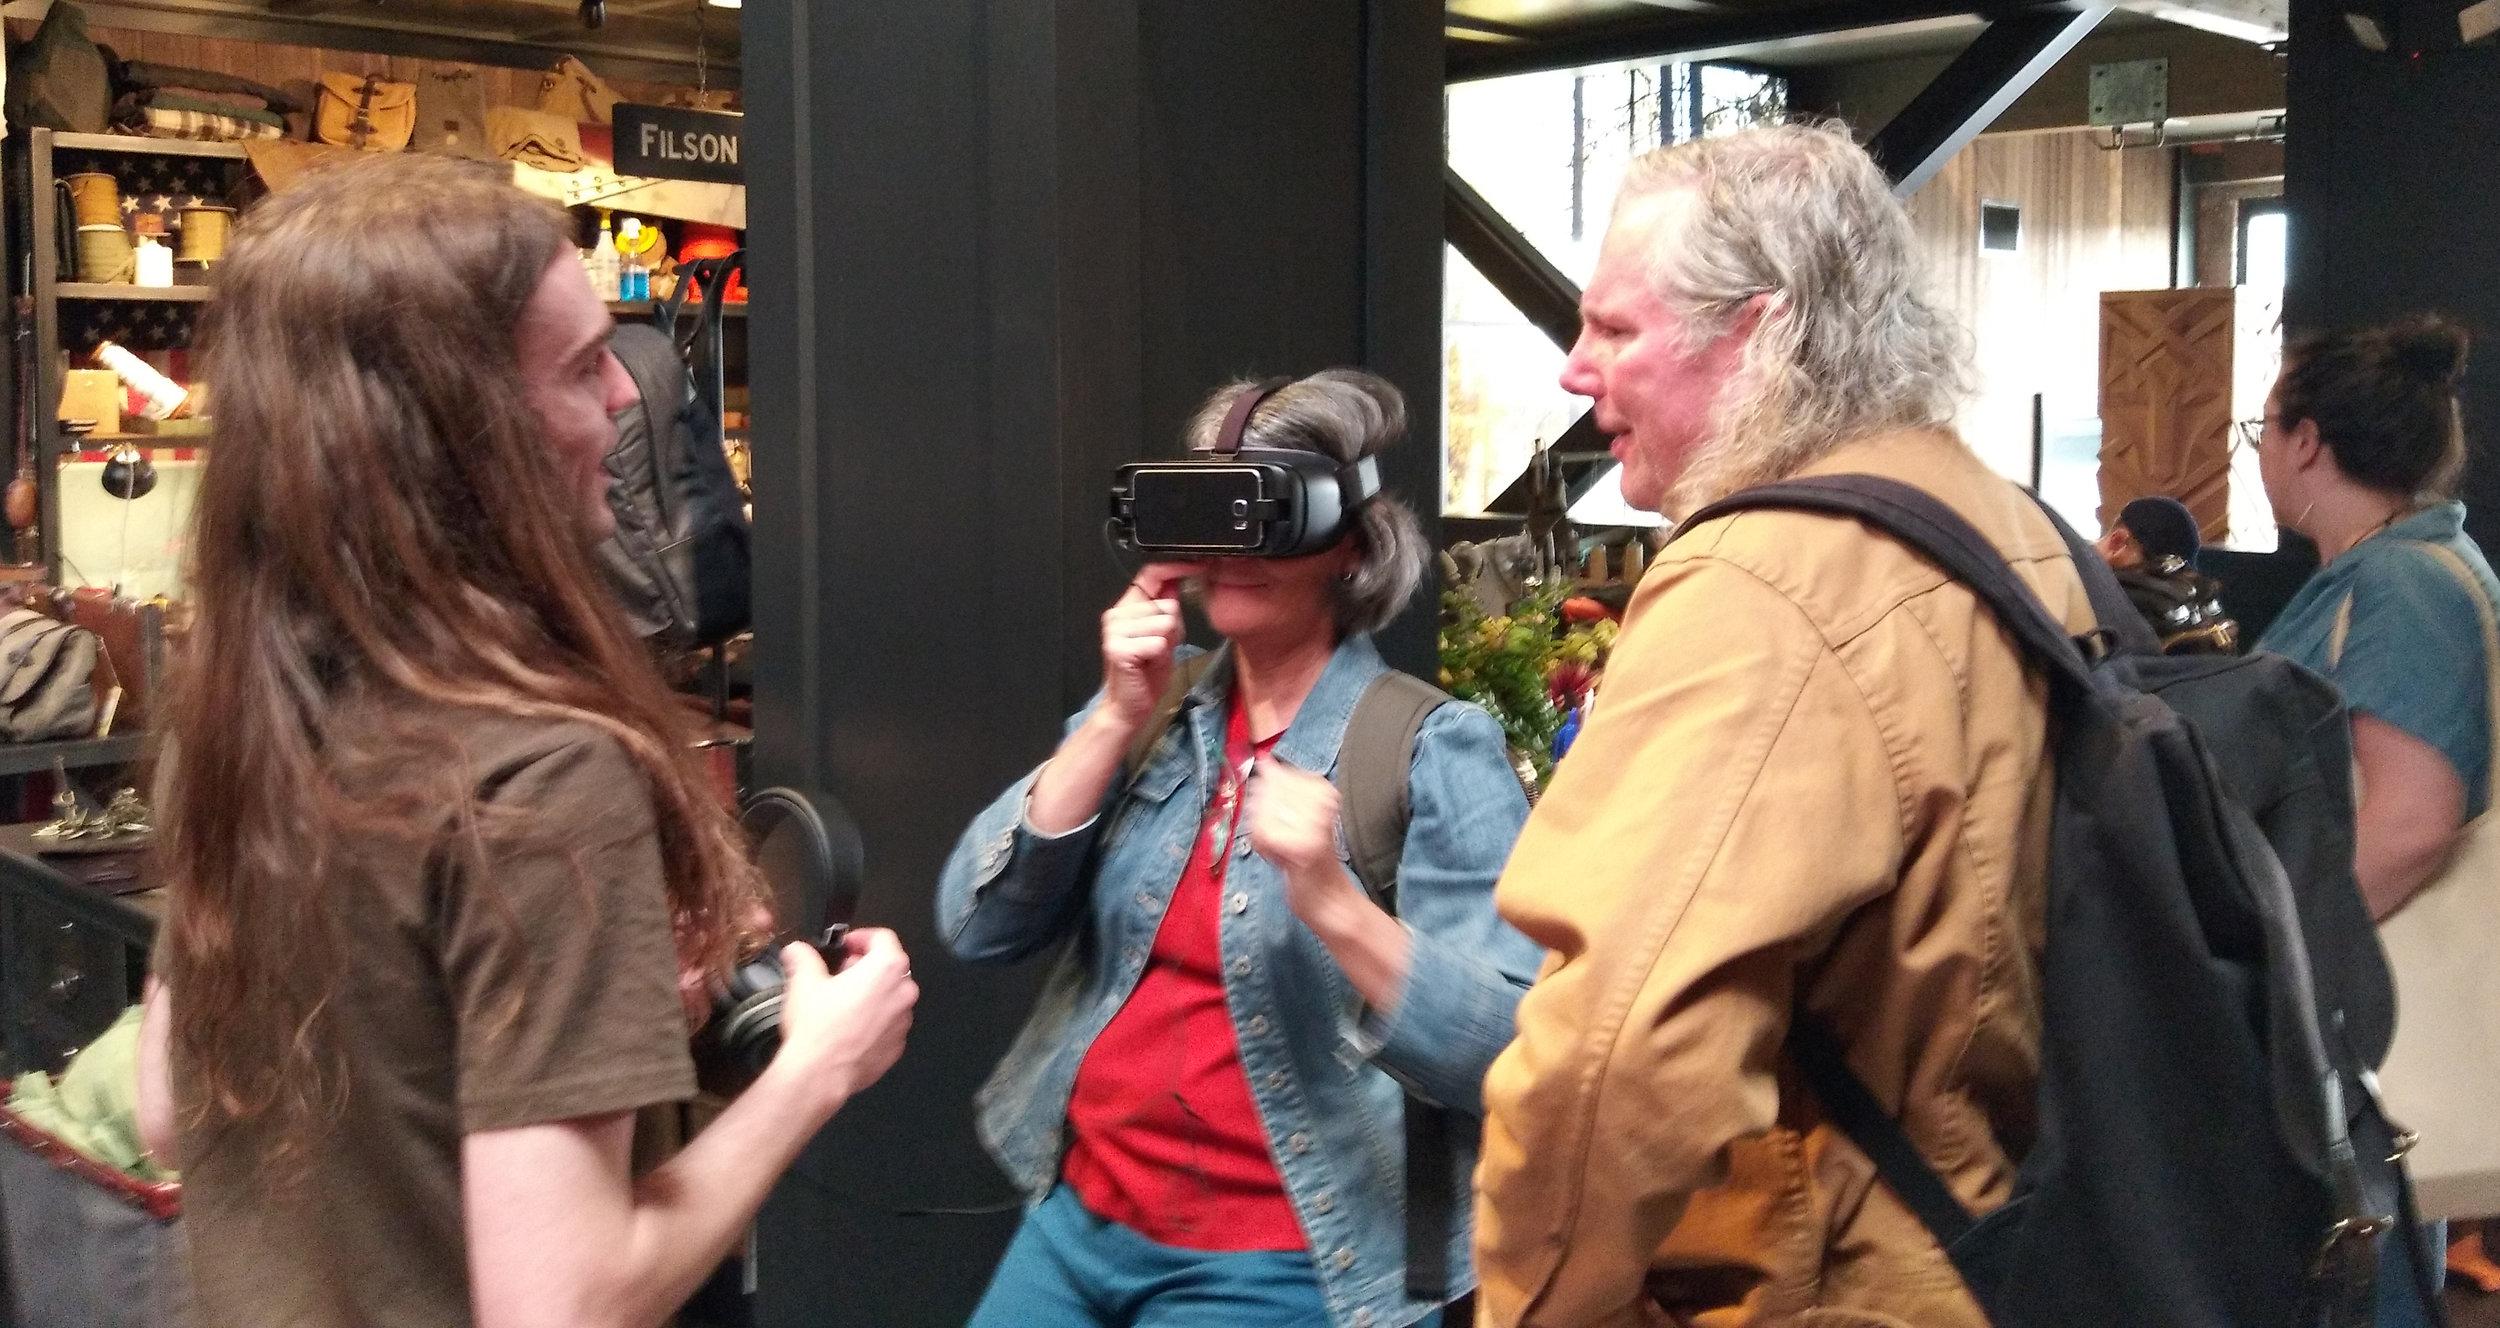 Filson Samsung Gear VR experience